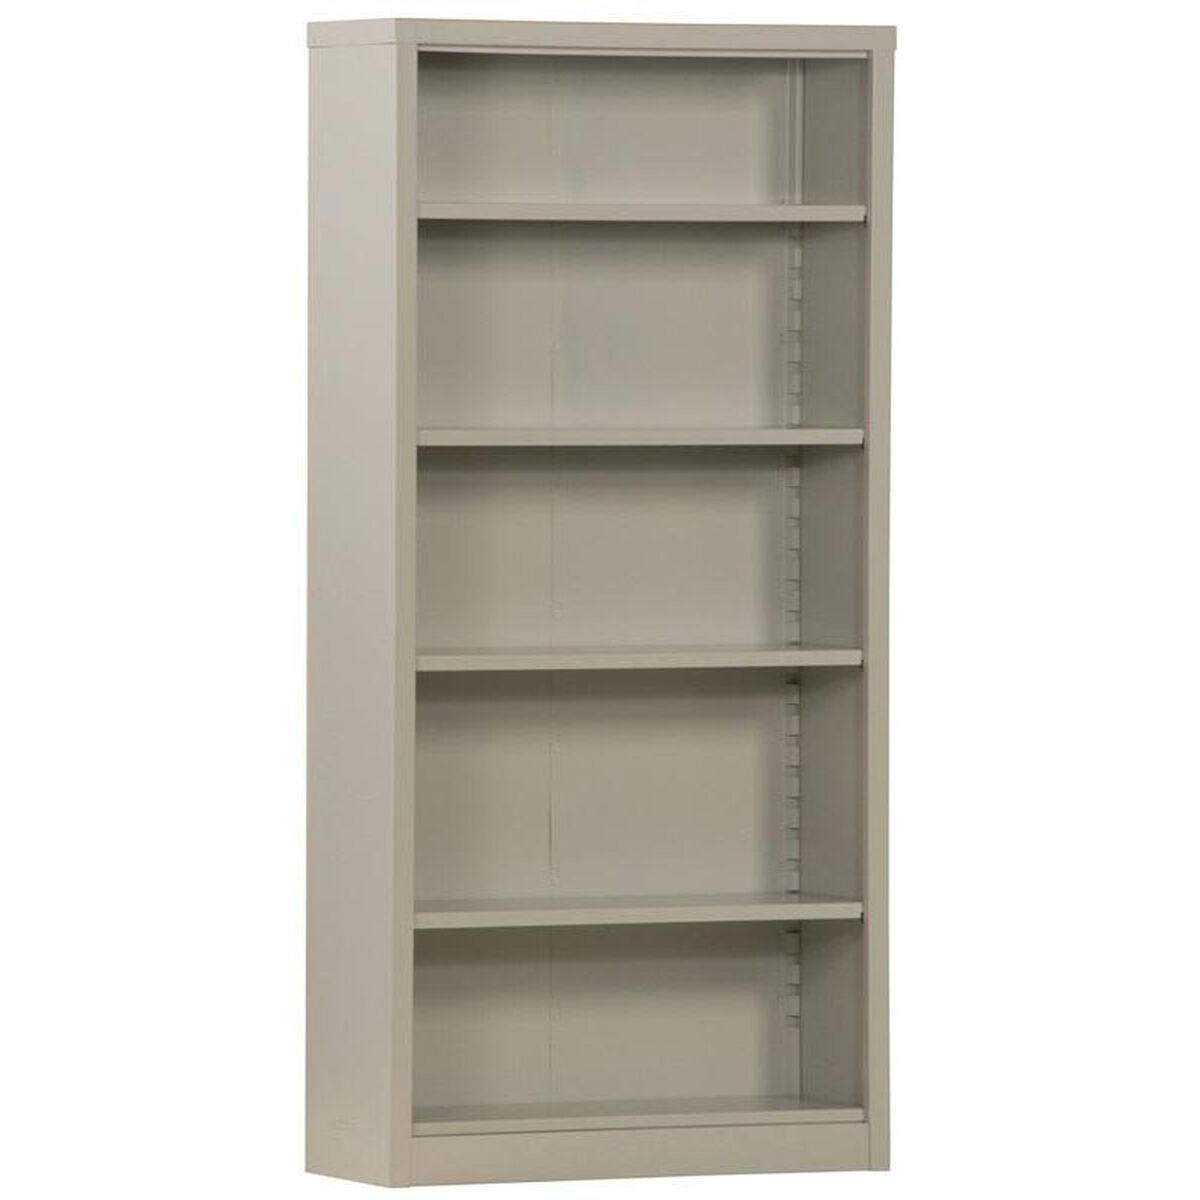 Snap 5 Shelf Bookcase 4 Adjust Bq40 351372 05 Churchchairs4lesscom